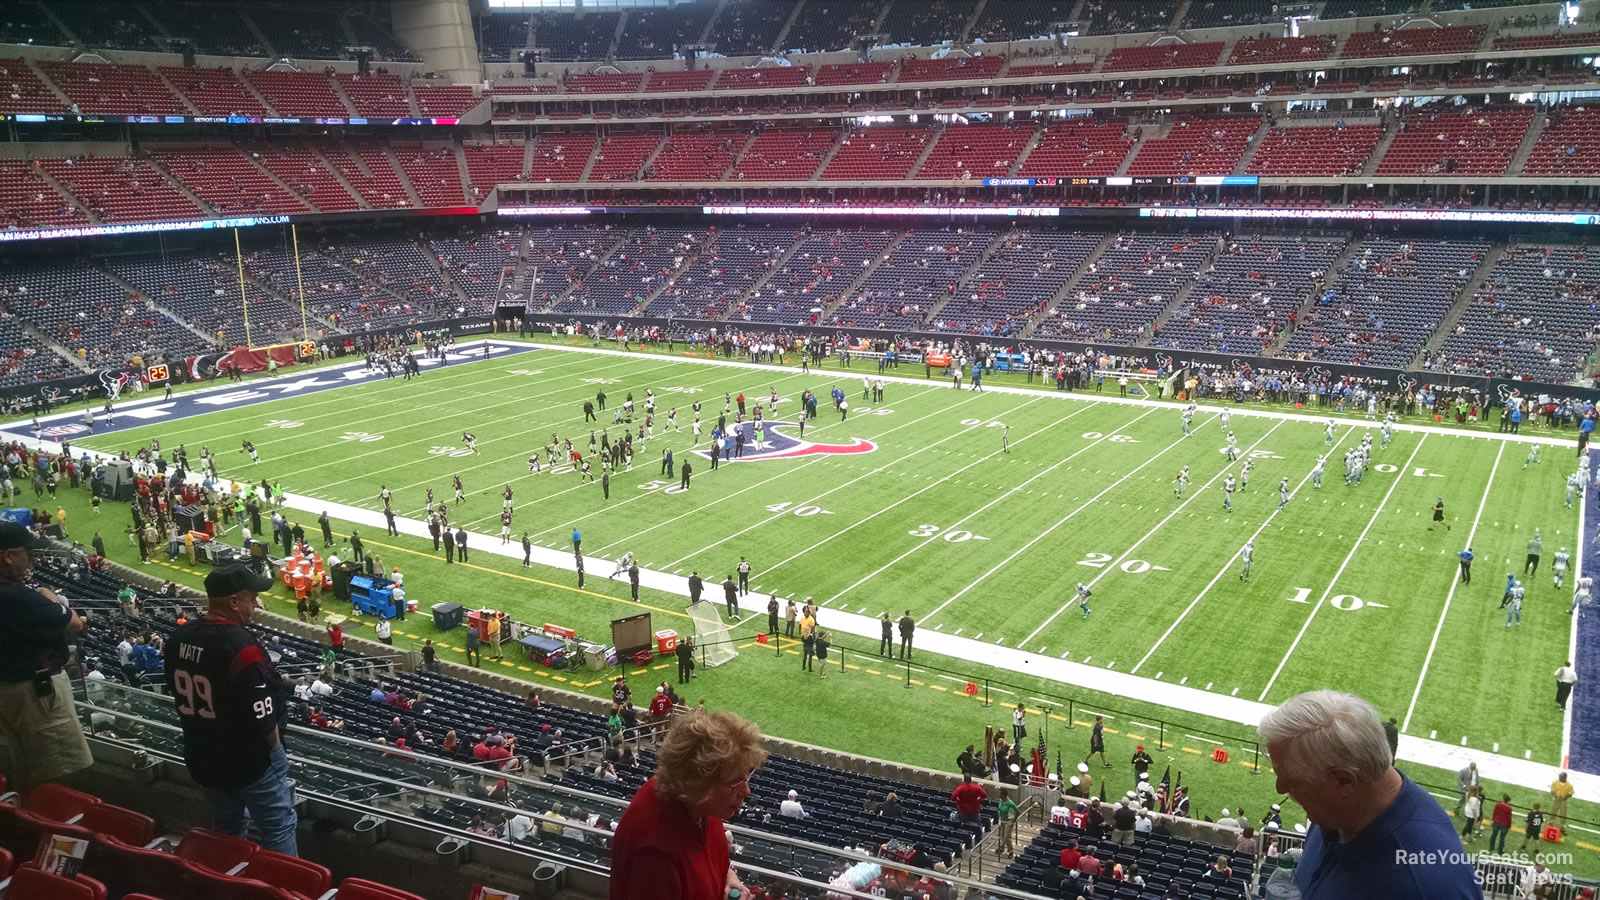 West Houston Vw >> NRG Stadium Section 306 - Houston Texans - RateYourSeats.com